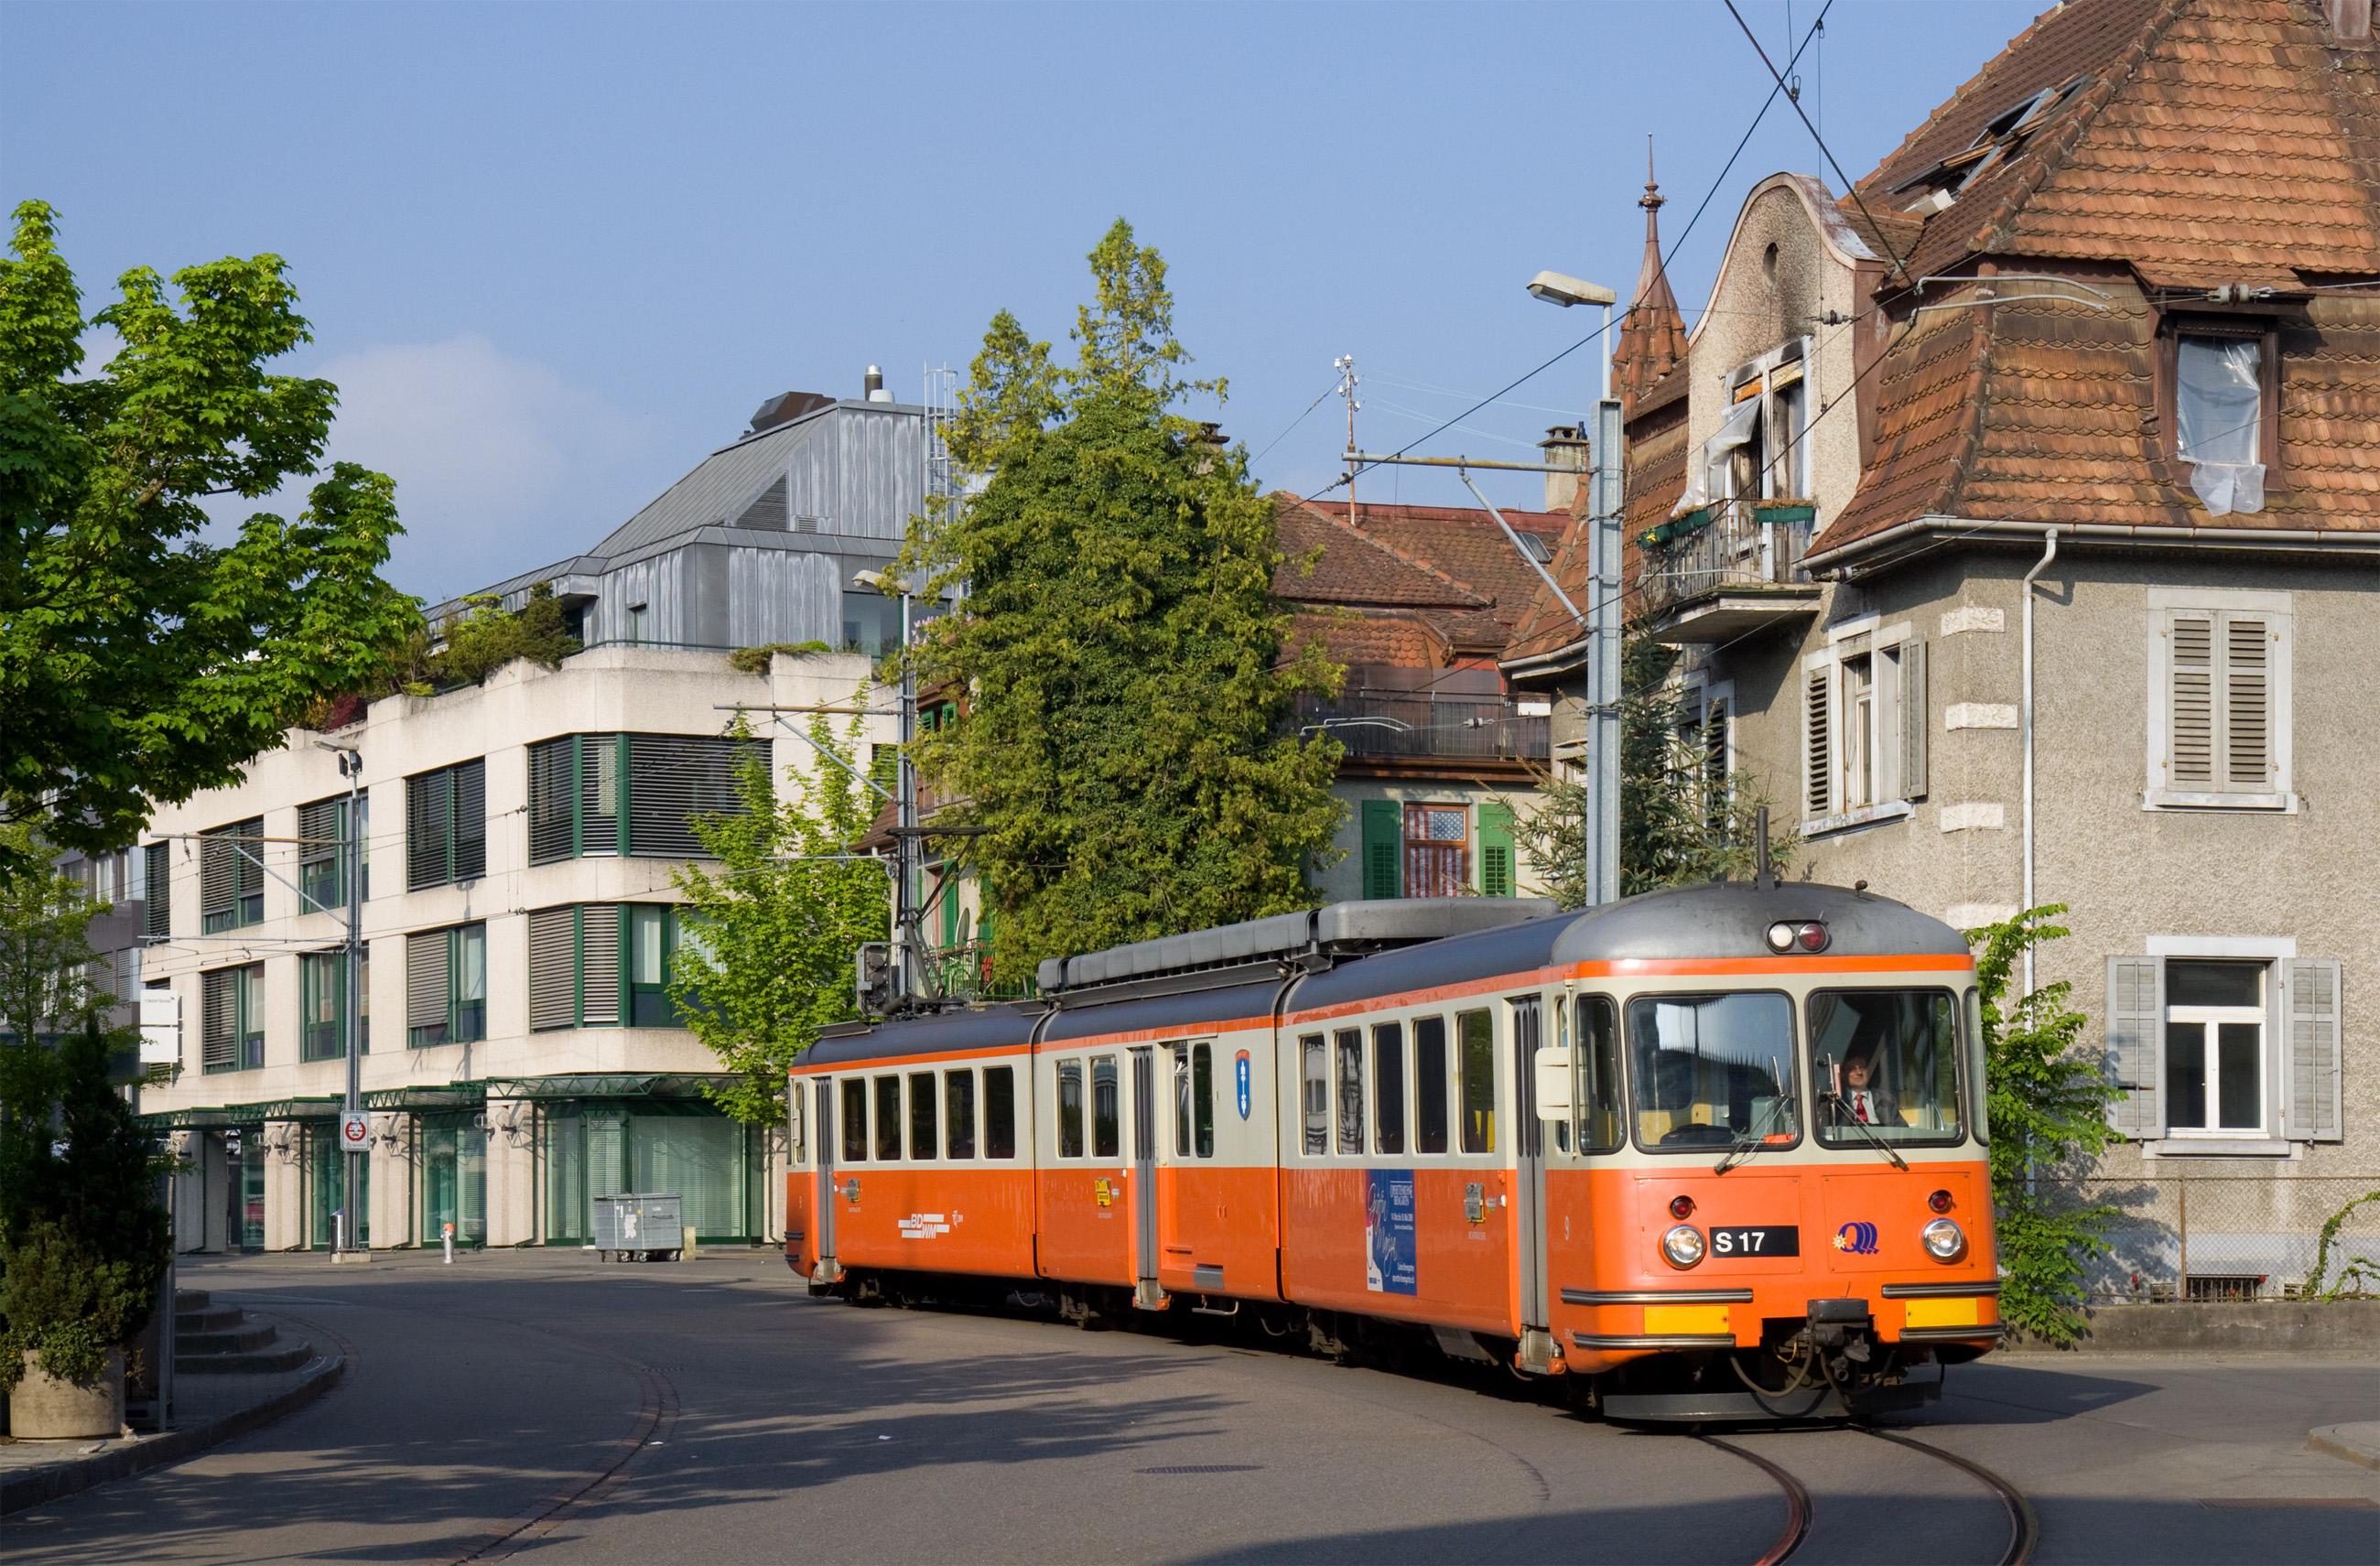 Dietikon Switzerland  city photos gallery : BDWM BDe 8 8 Ortsdurchfahrt Dietikon Wikimedia Commons